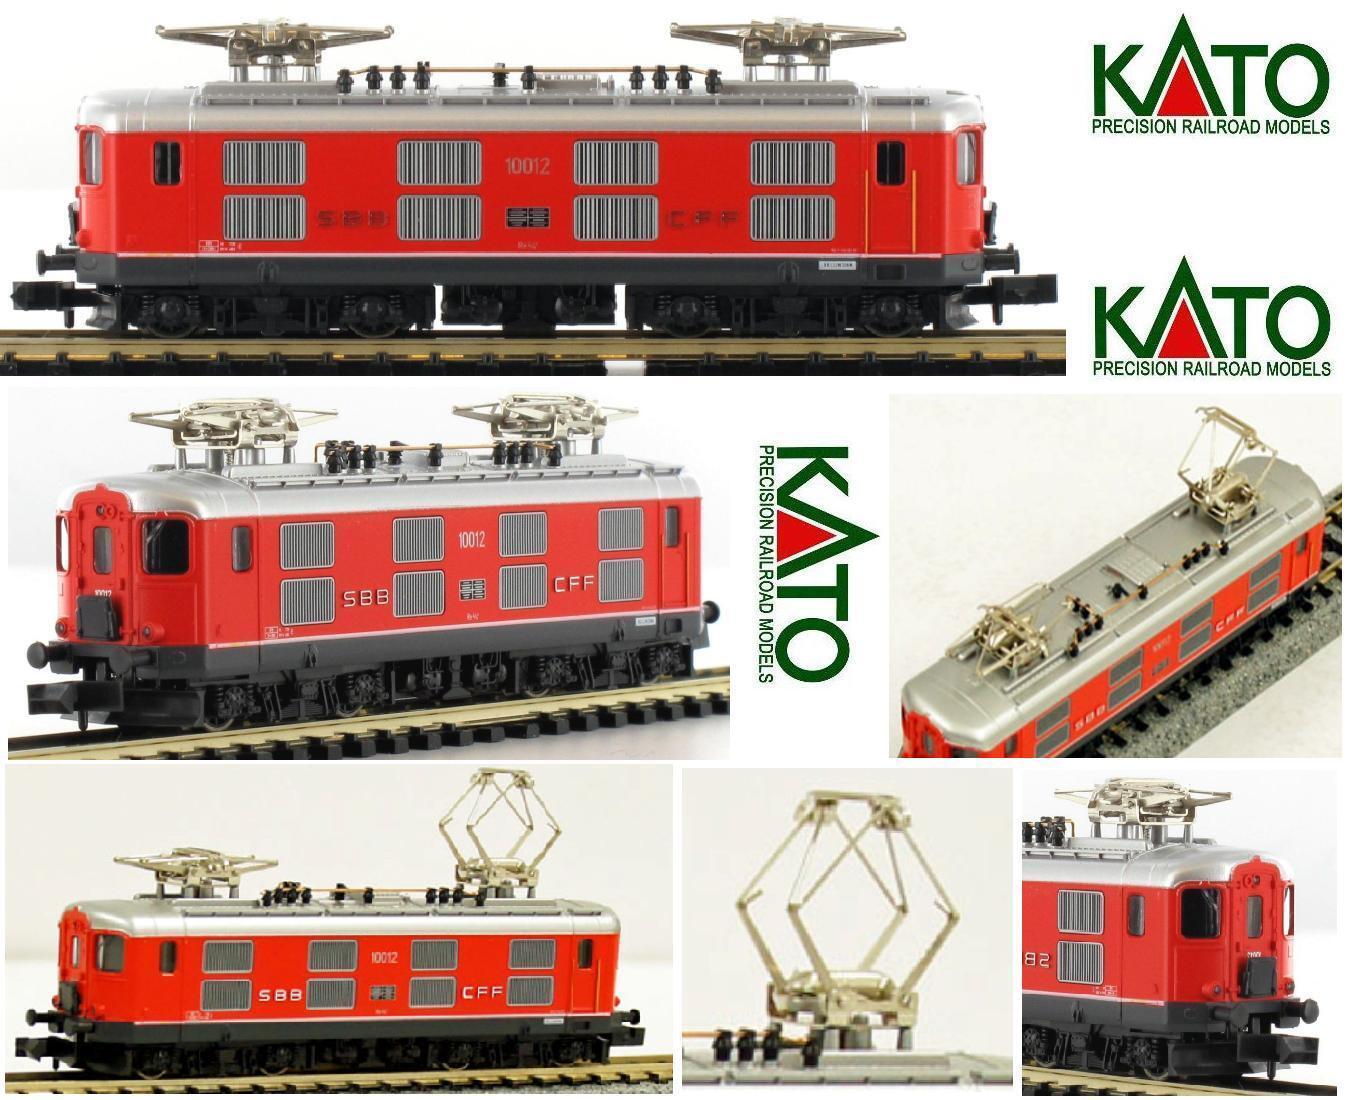 Kato k11604 Locomotive Electric King 4 4 the regional lines SBB-CFF Suisse scale-N